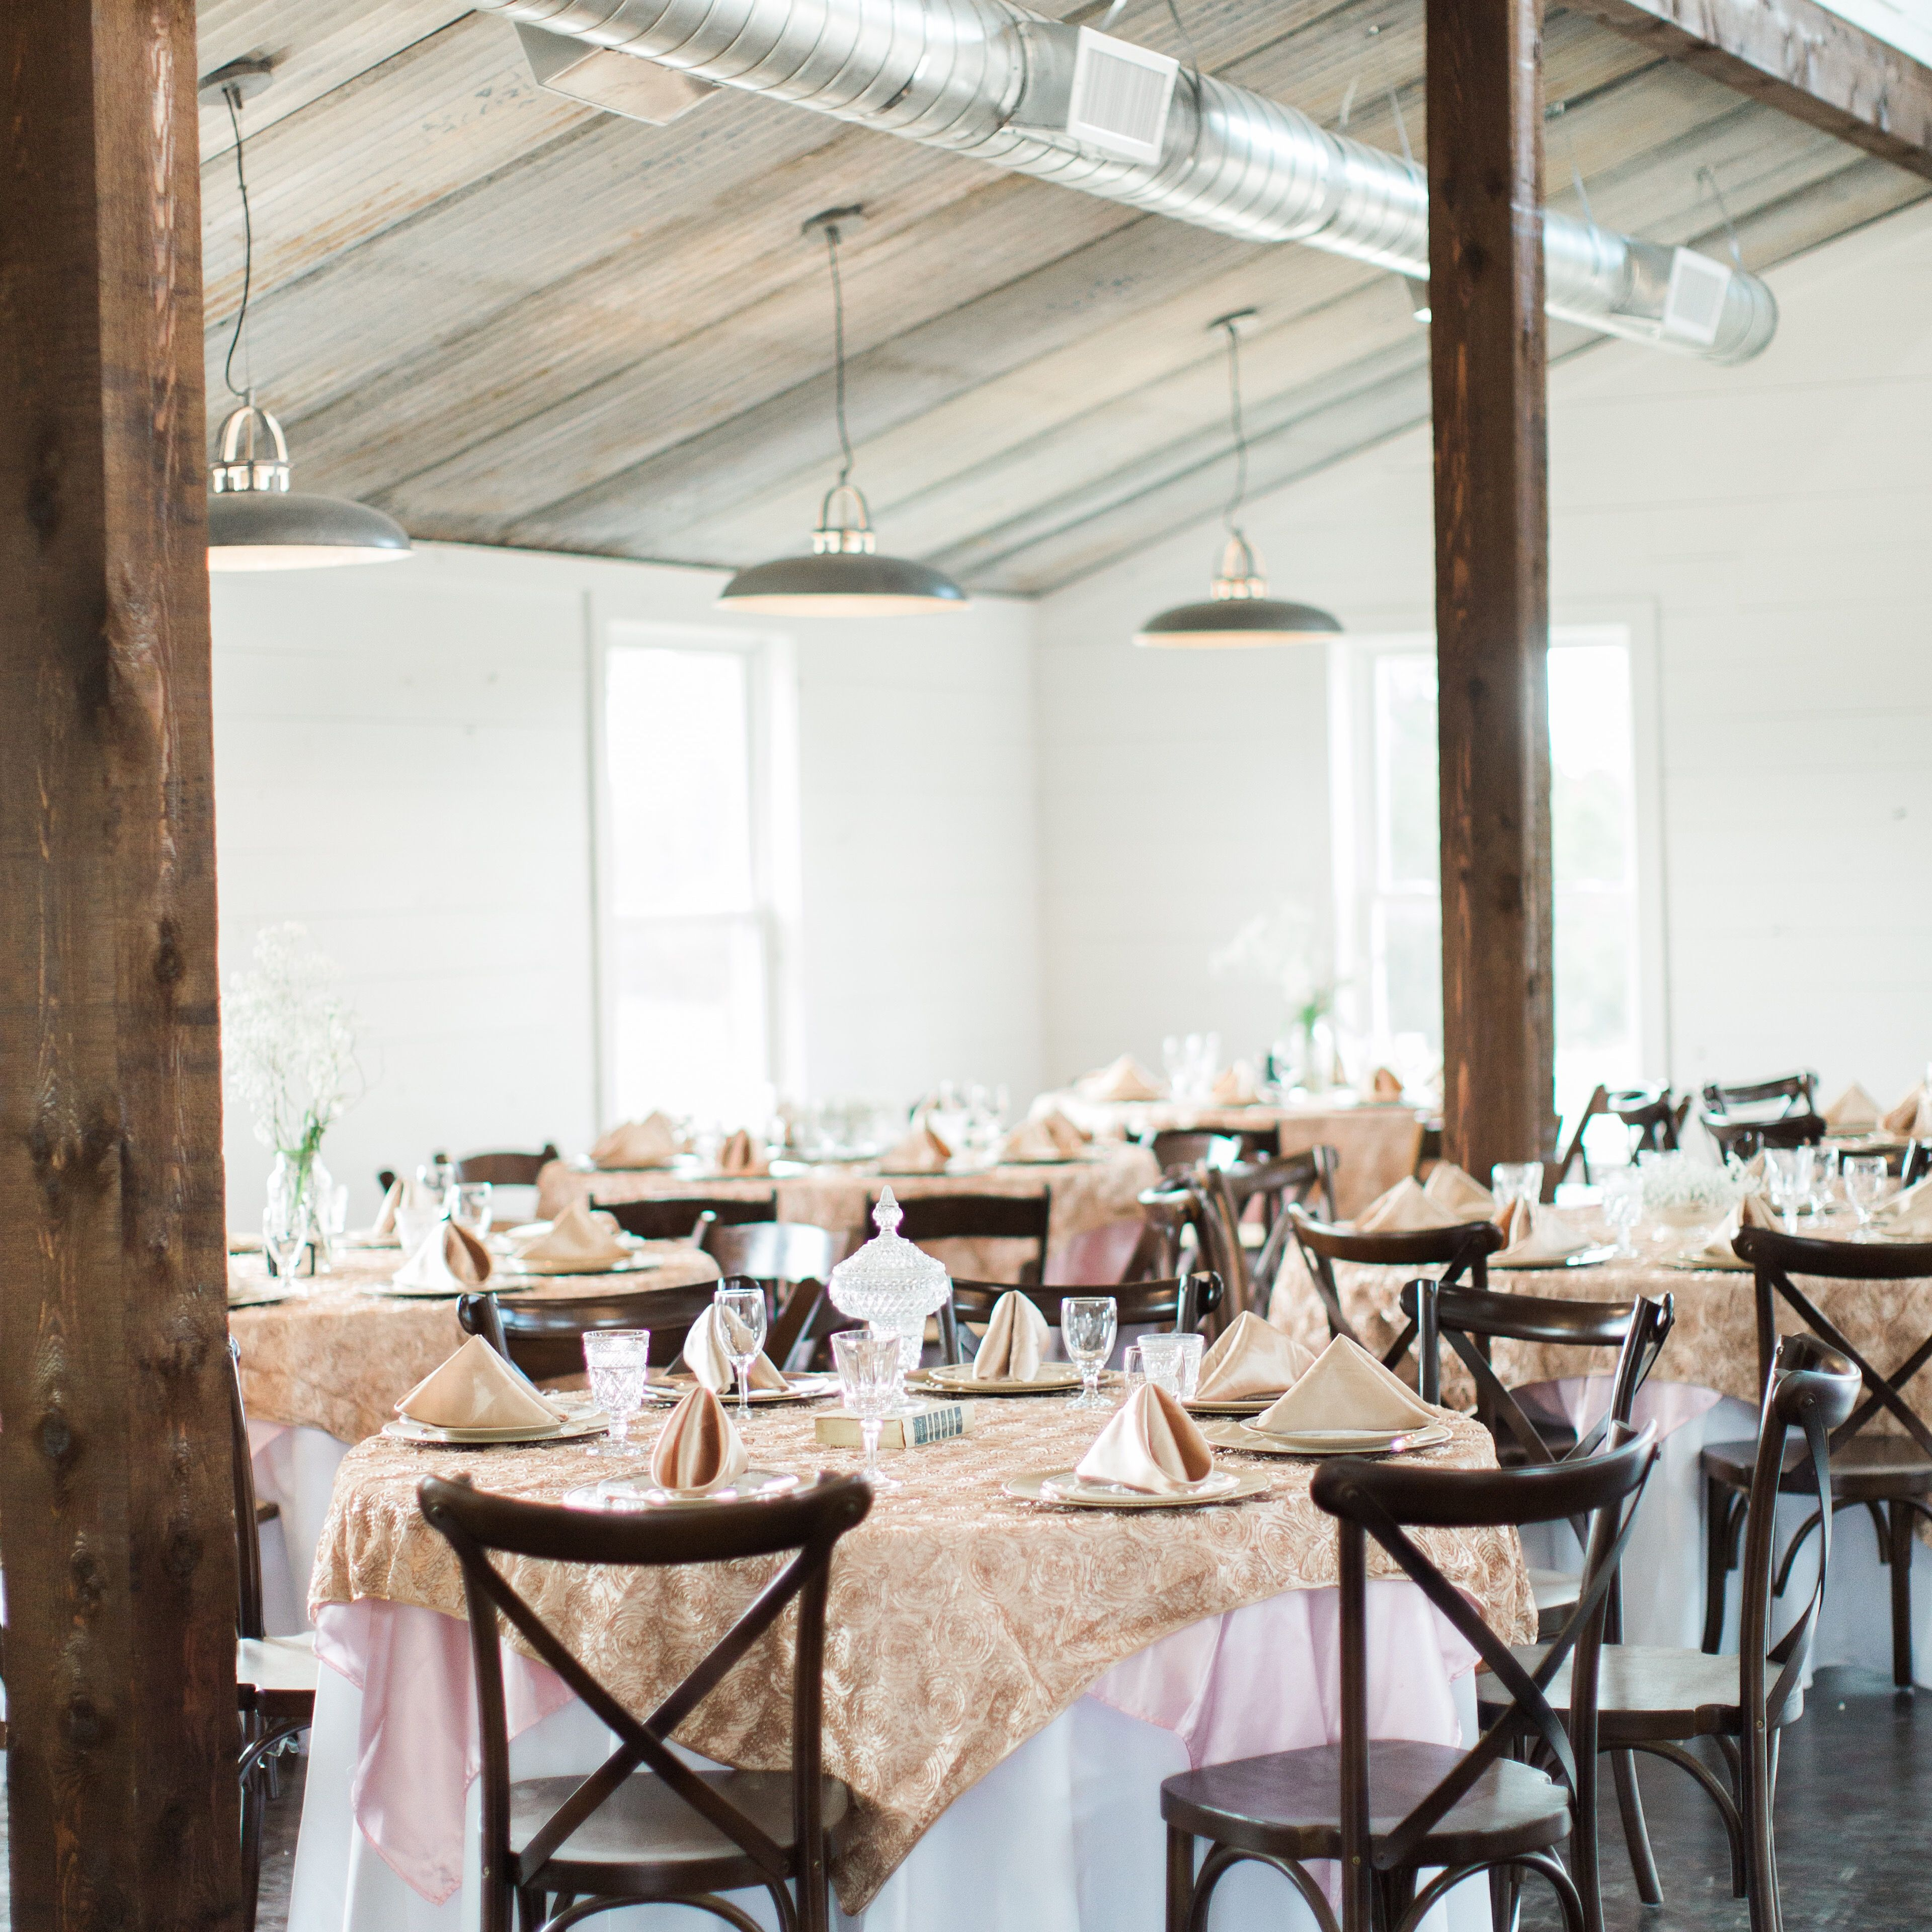 Five Oaks Farm Farm wedding venue, Barn style house, Venues